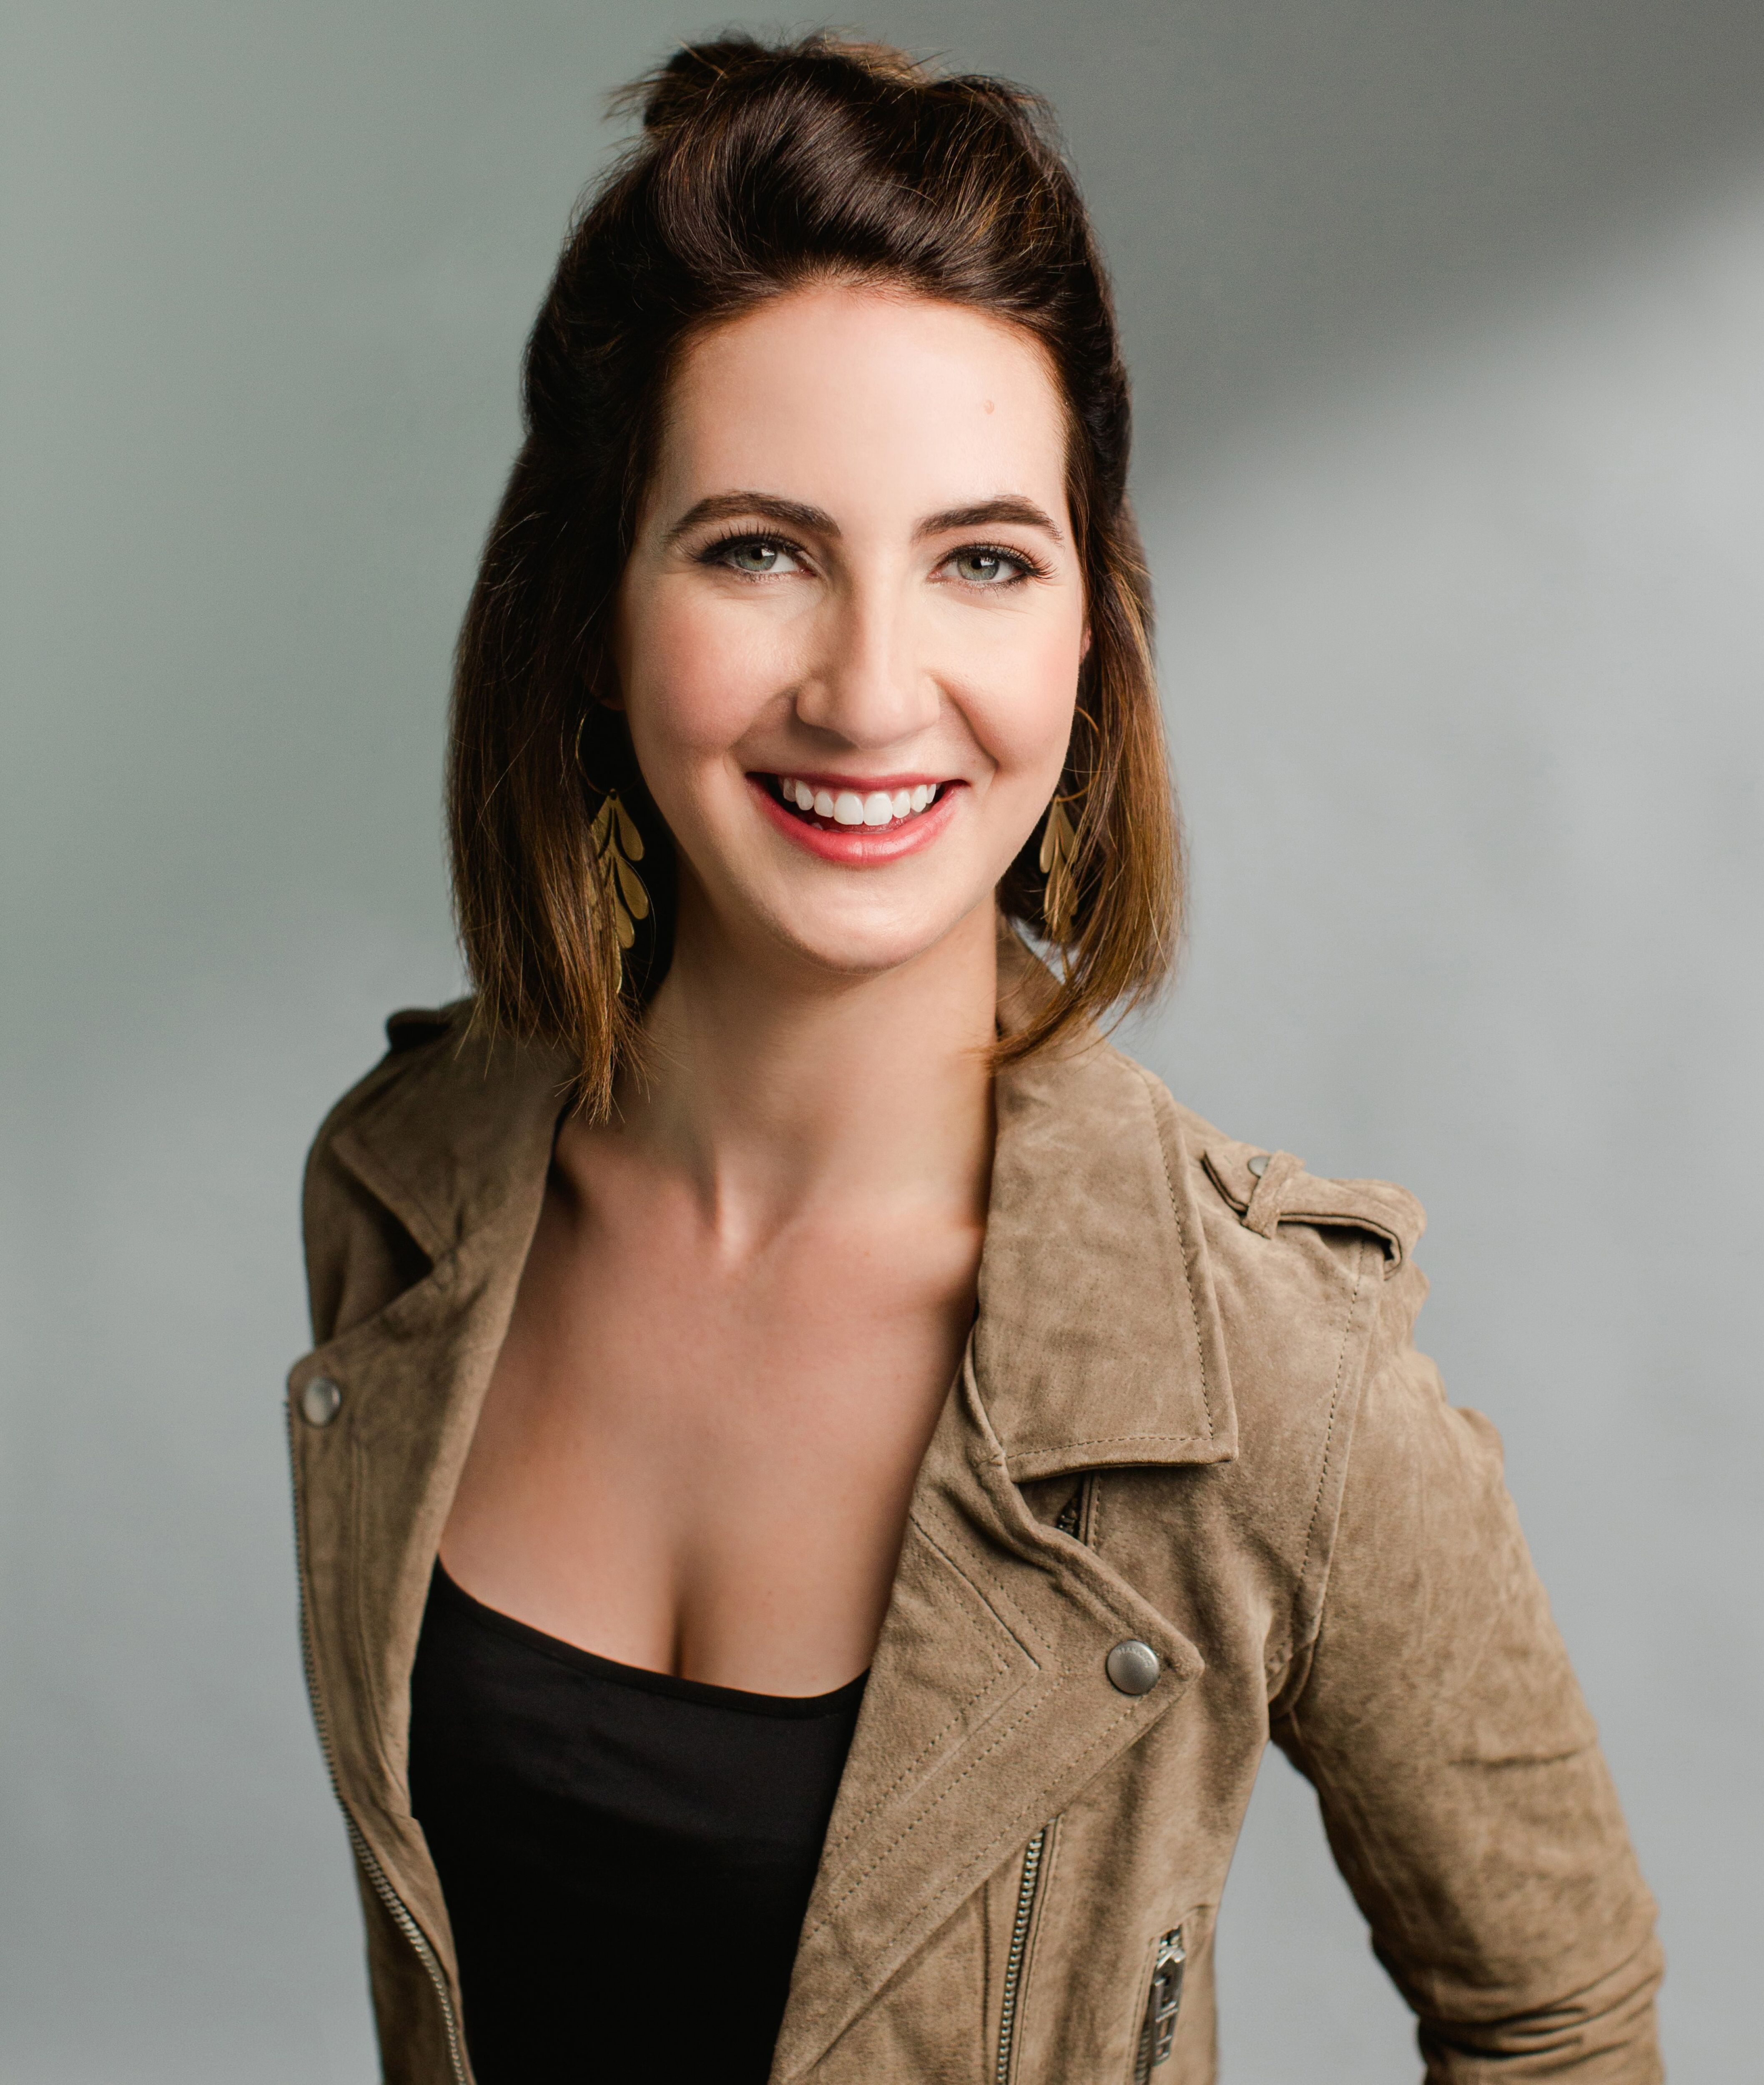 Lexie Larsen